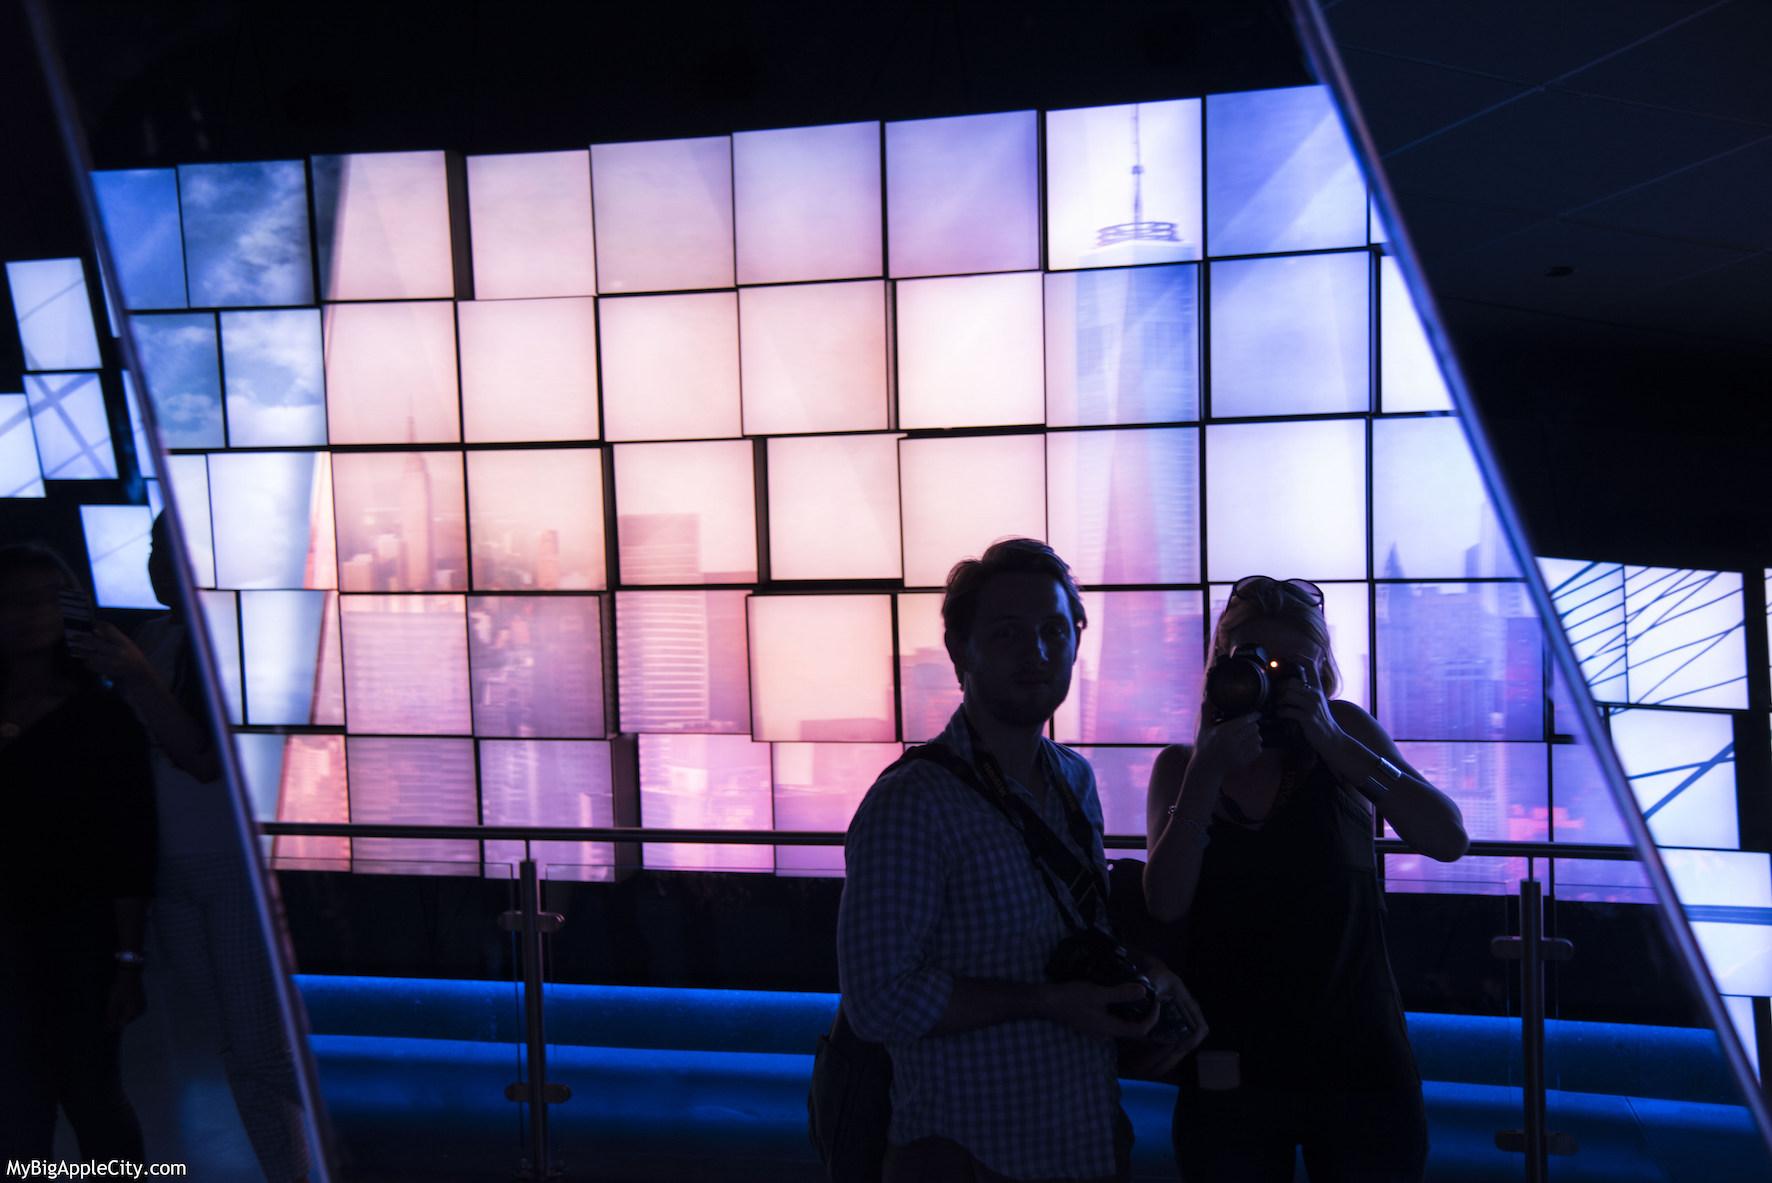 New-York-WTC-Observatory-NYCblogger-MyBigAppleCity